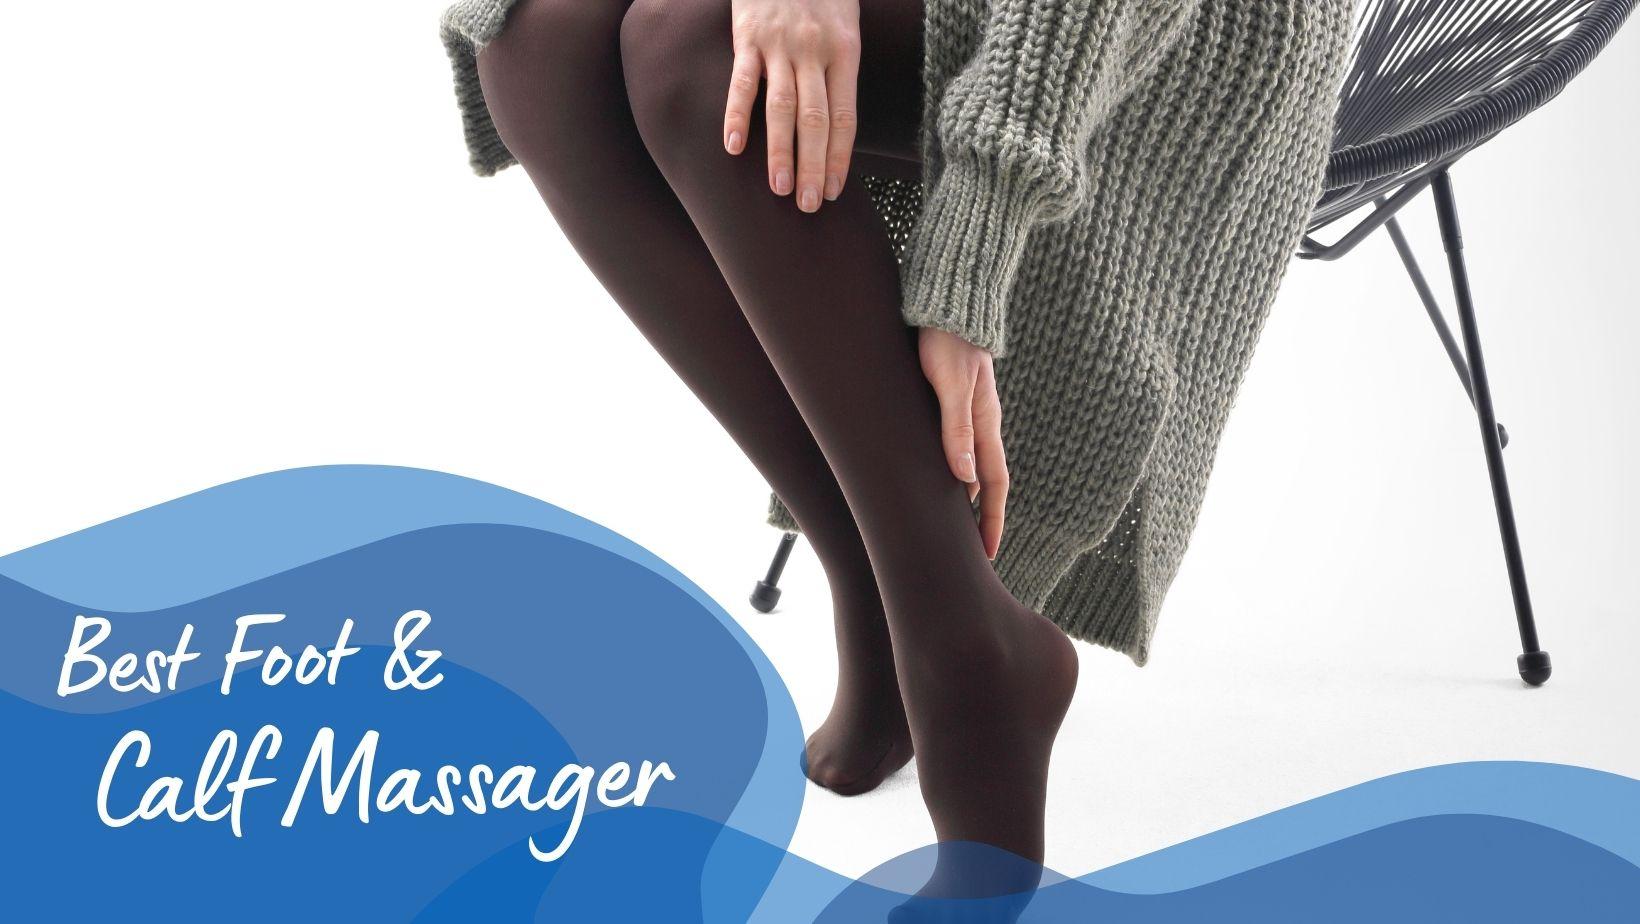 Best Foot and Calf Massage